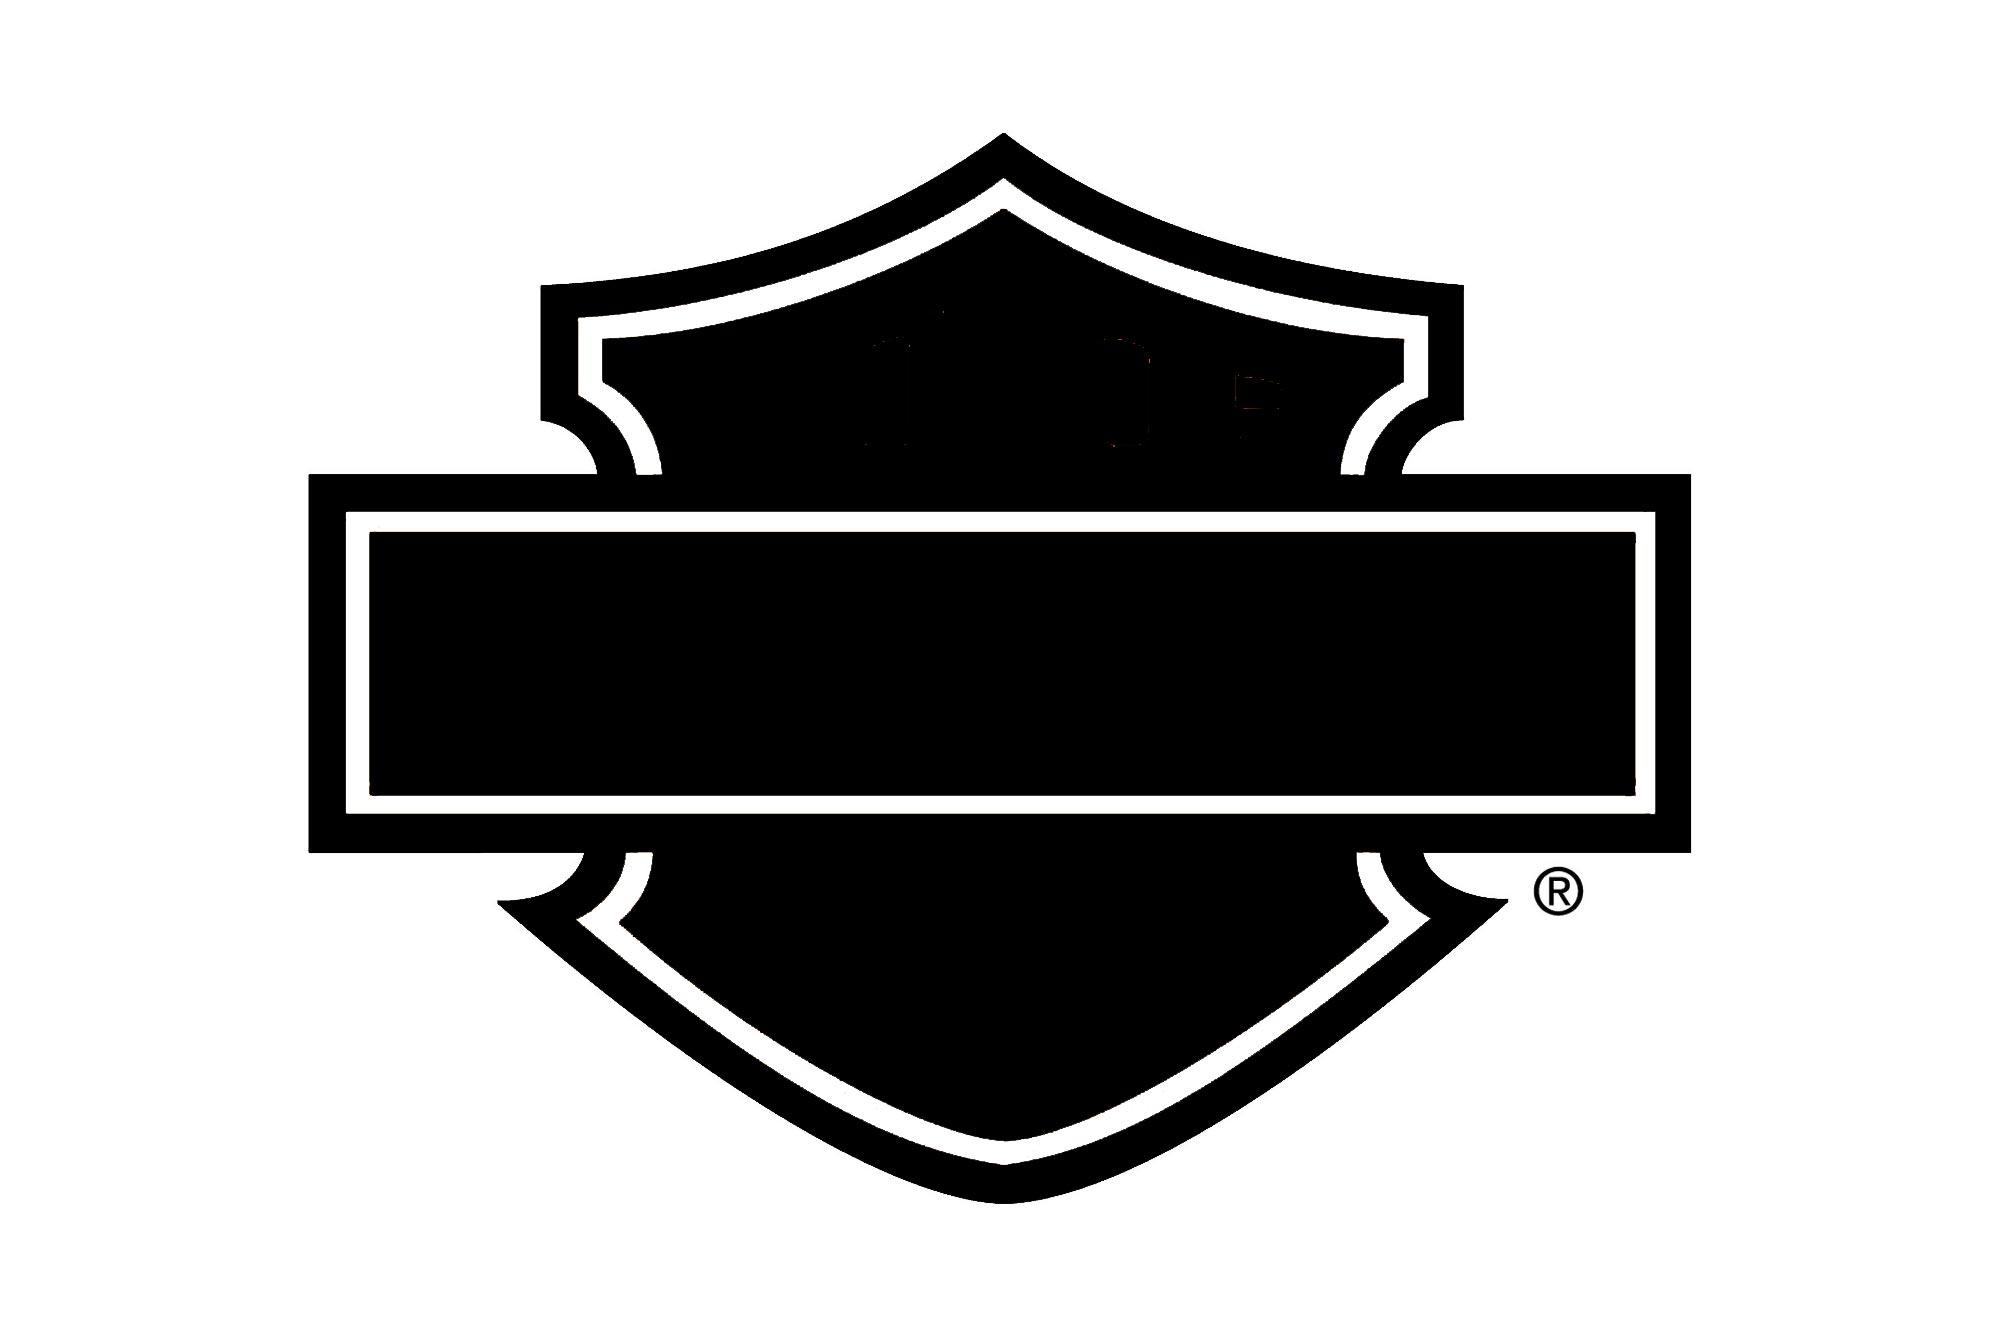 Harley Davidson Symbol: Harley-Davidson Laying Off 200 US Workers